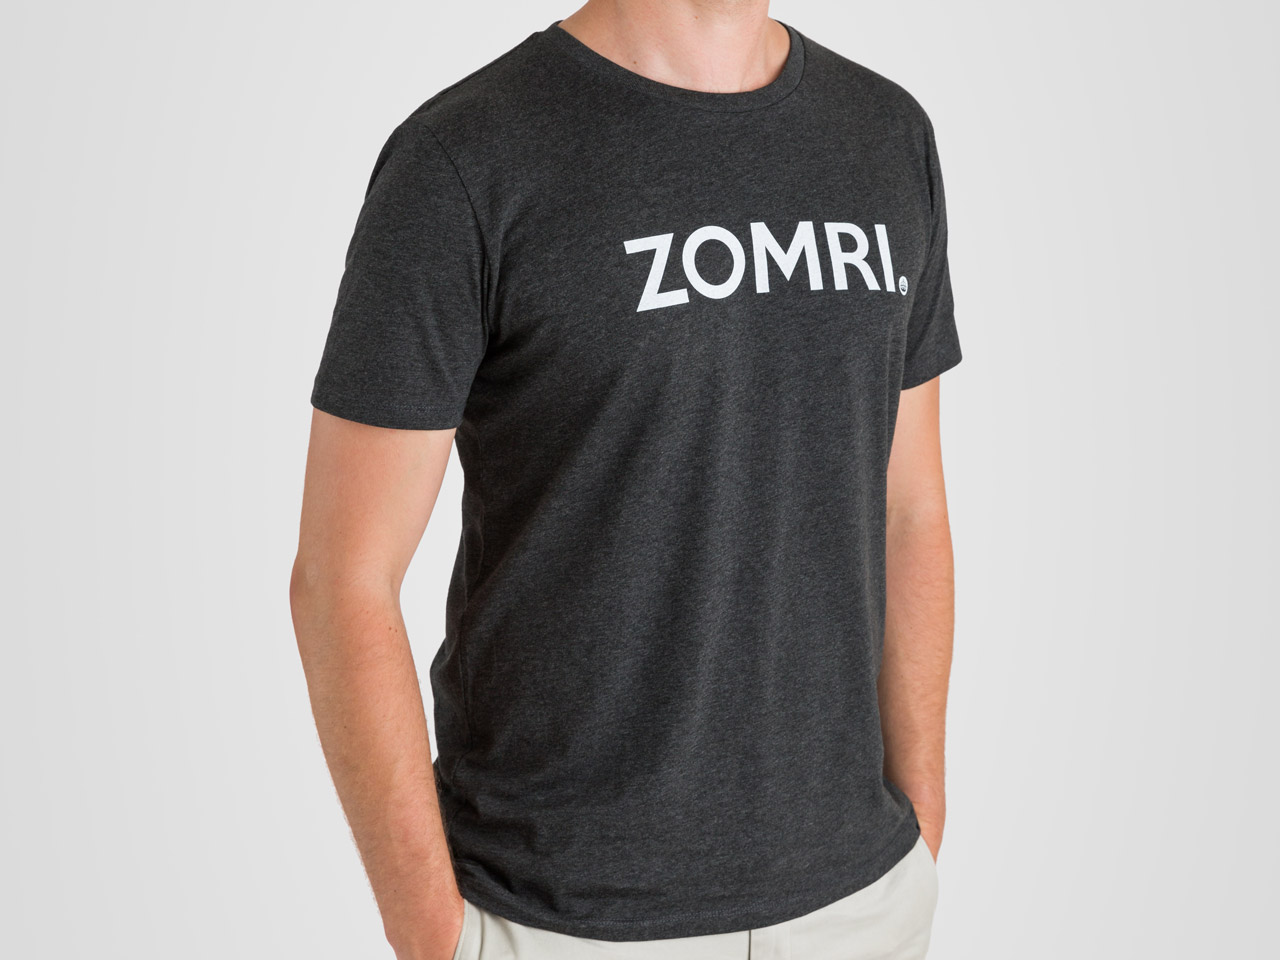 8627371edb Zomri — Kompot.sk